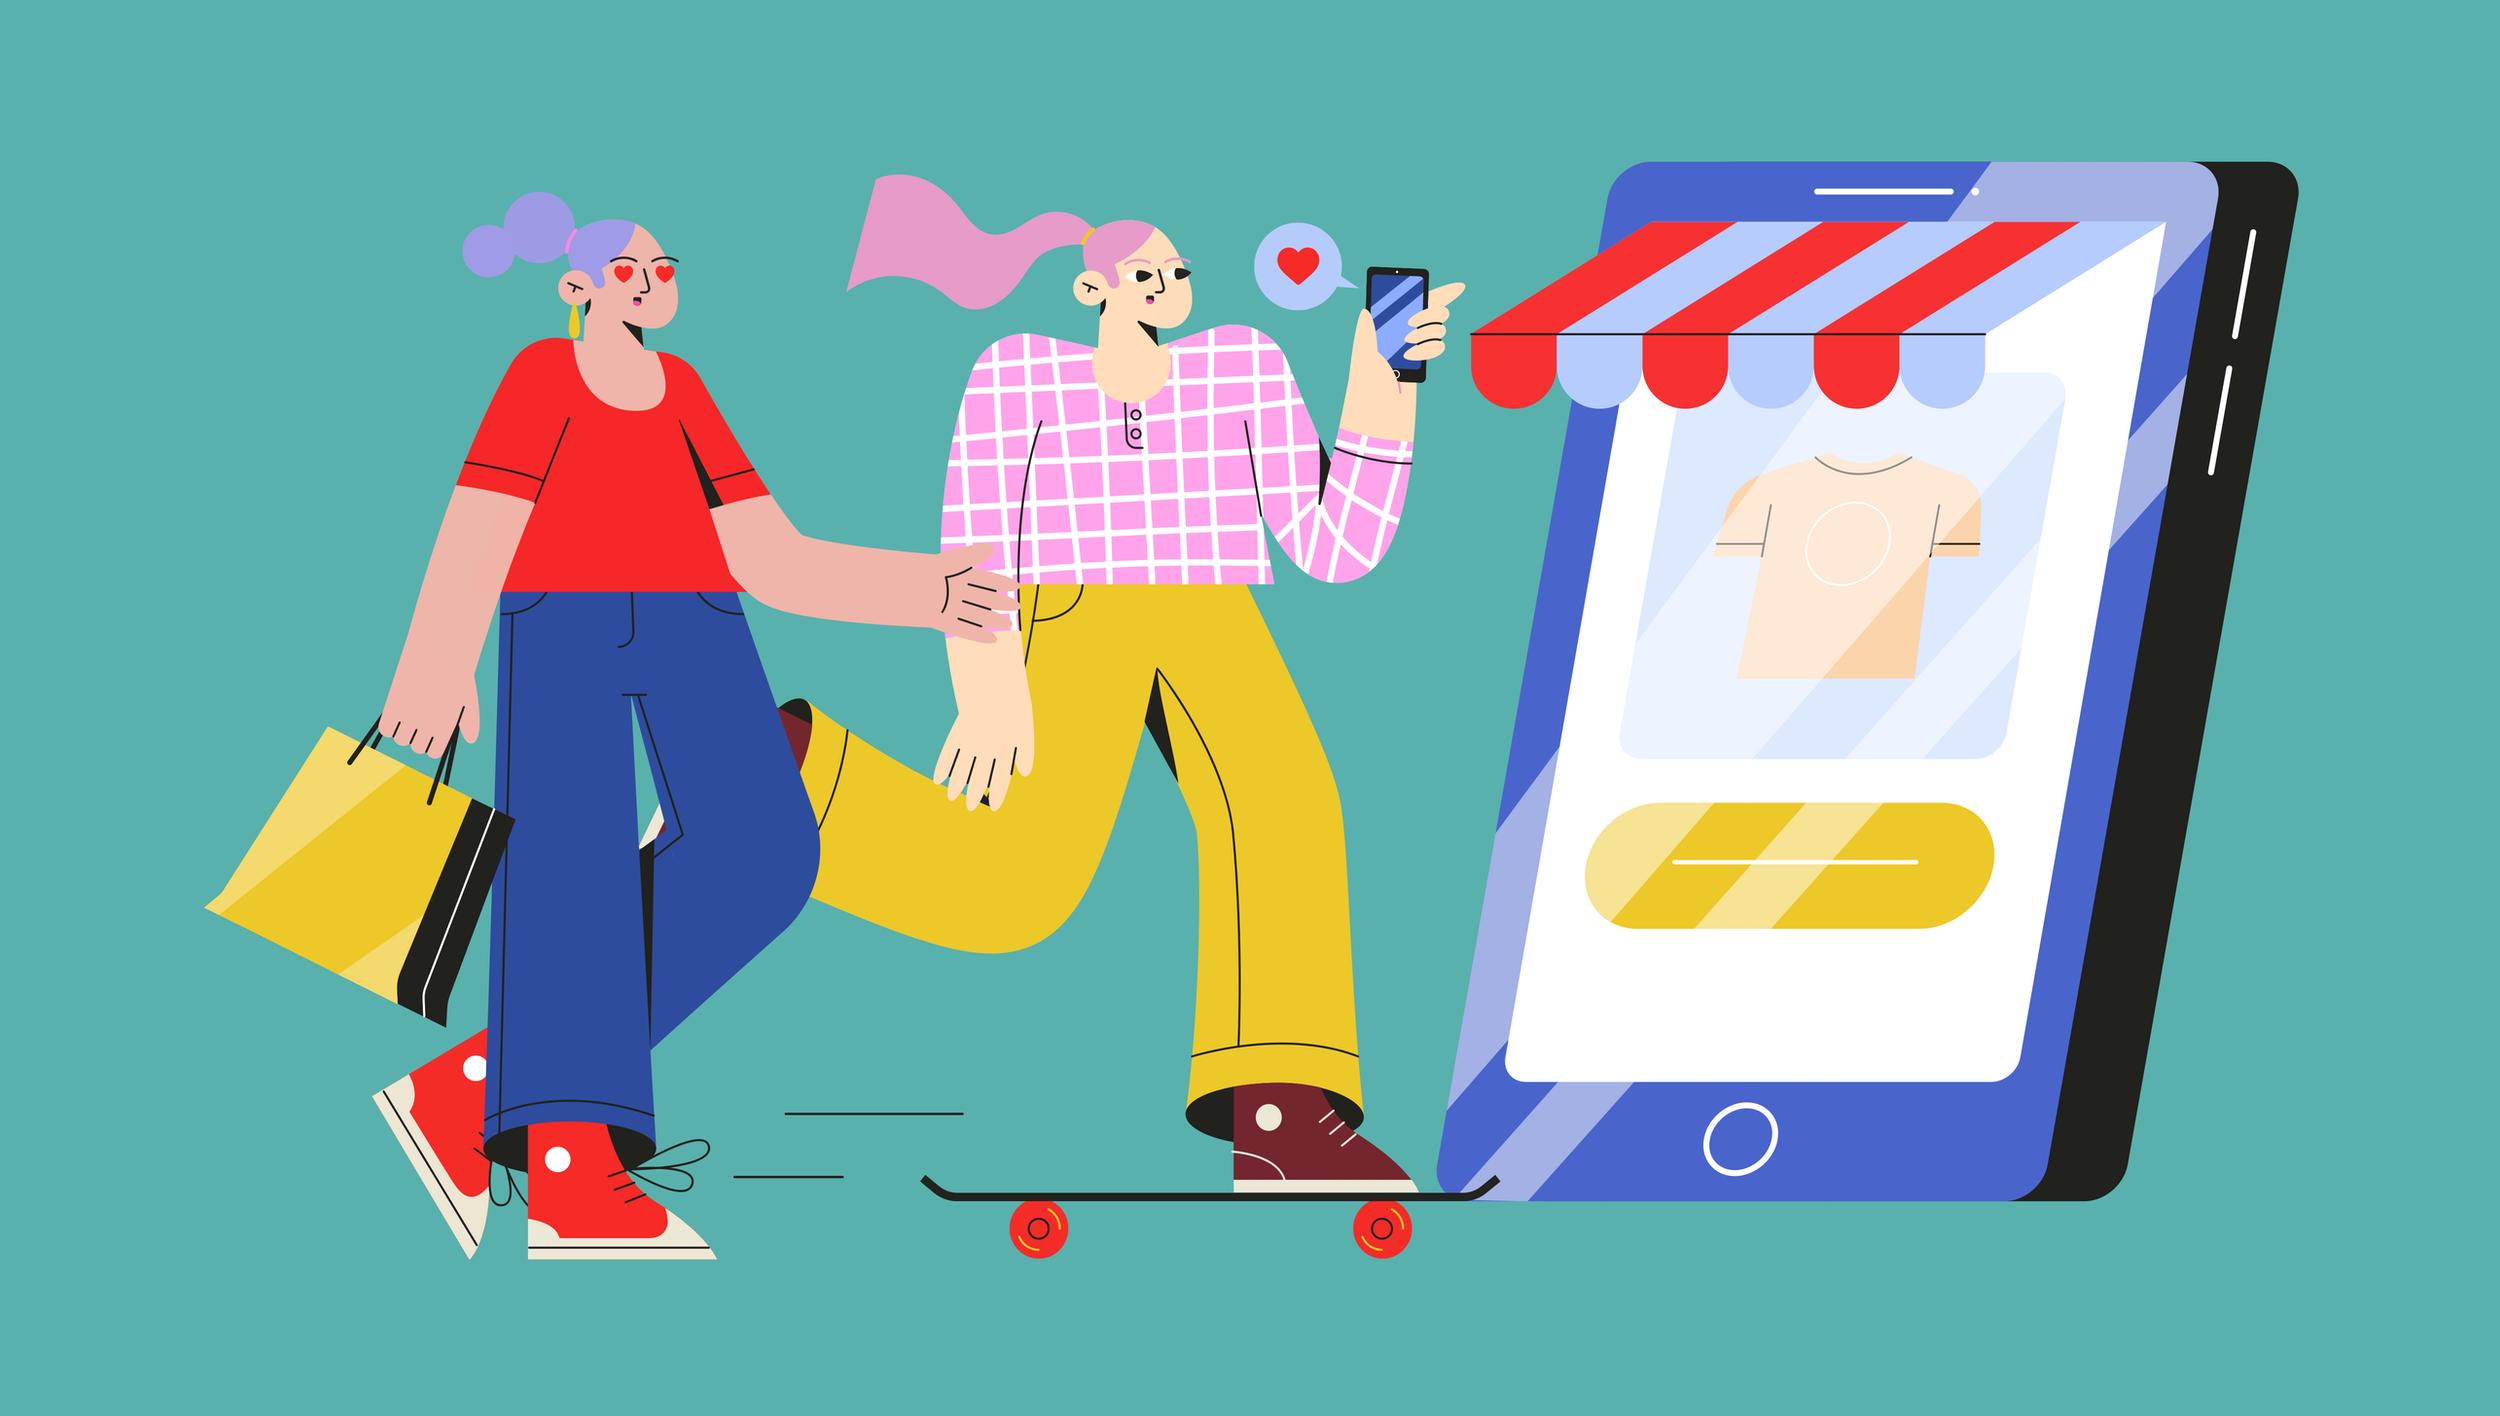 The future of shopping malls: Digitalization